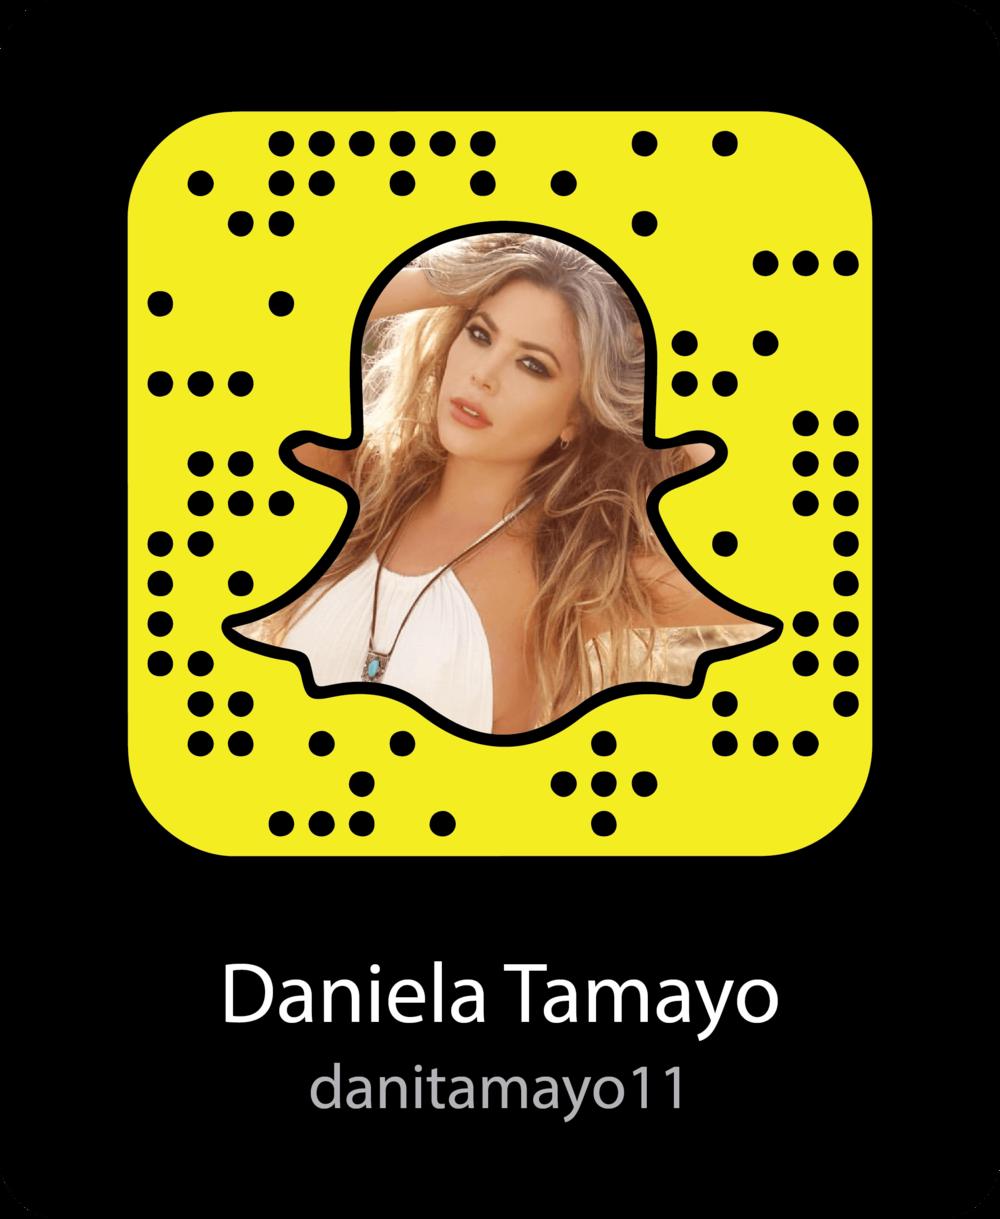 daniela-tamayo-sexy-snapchat-snapcode